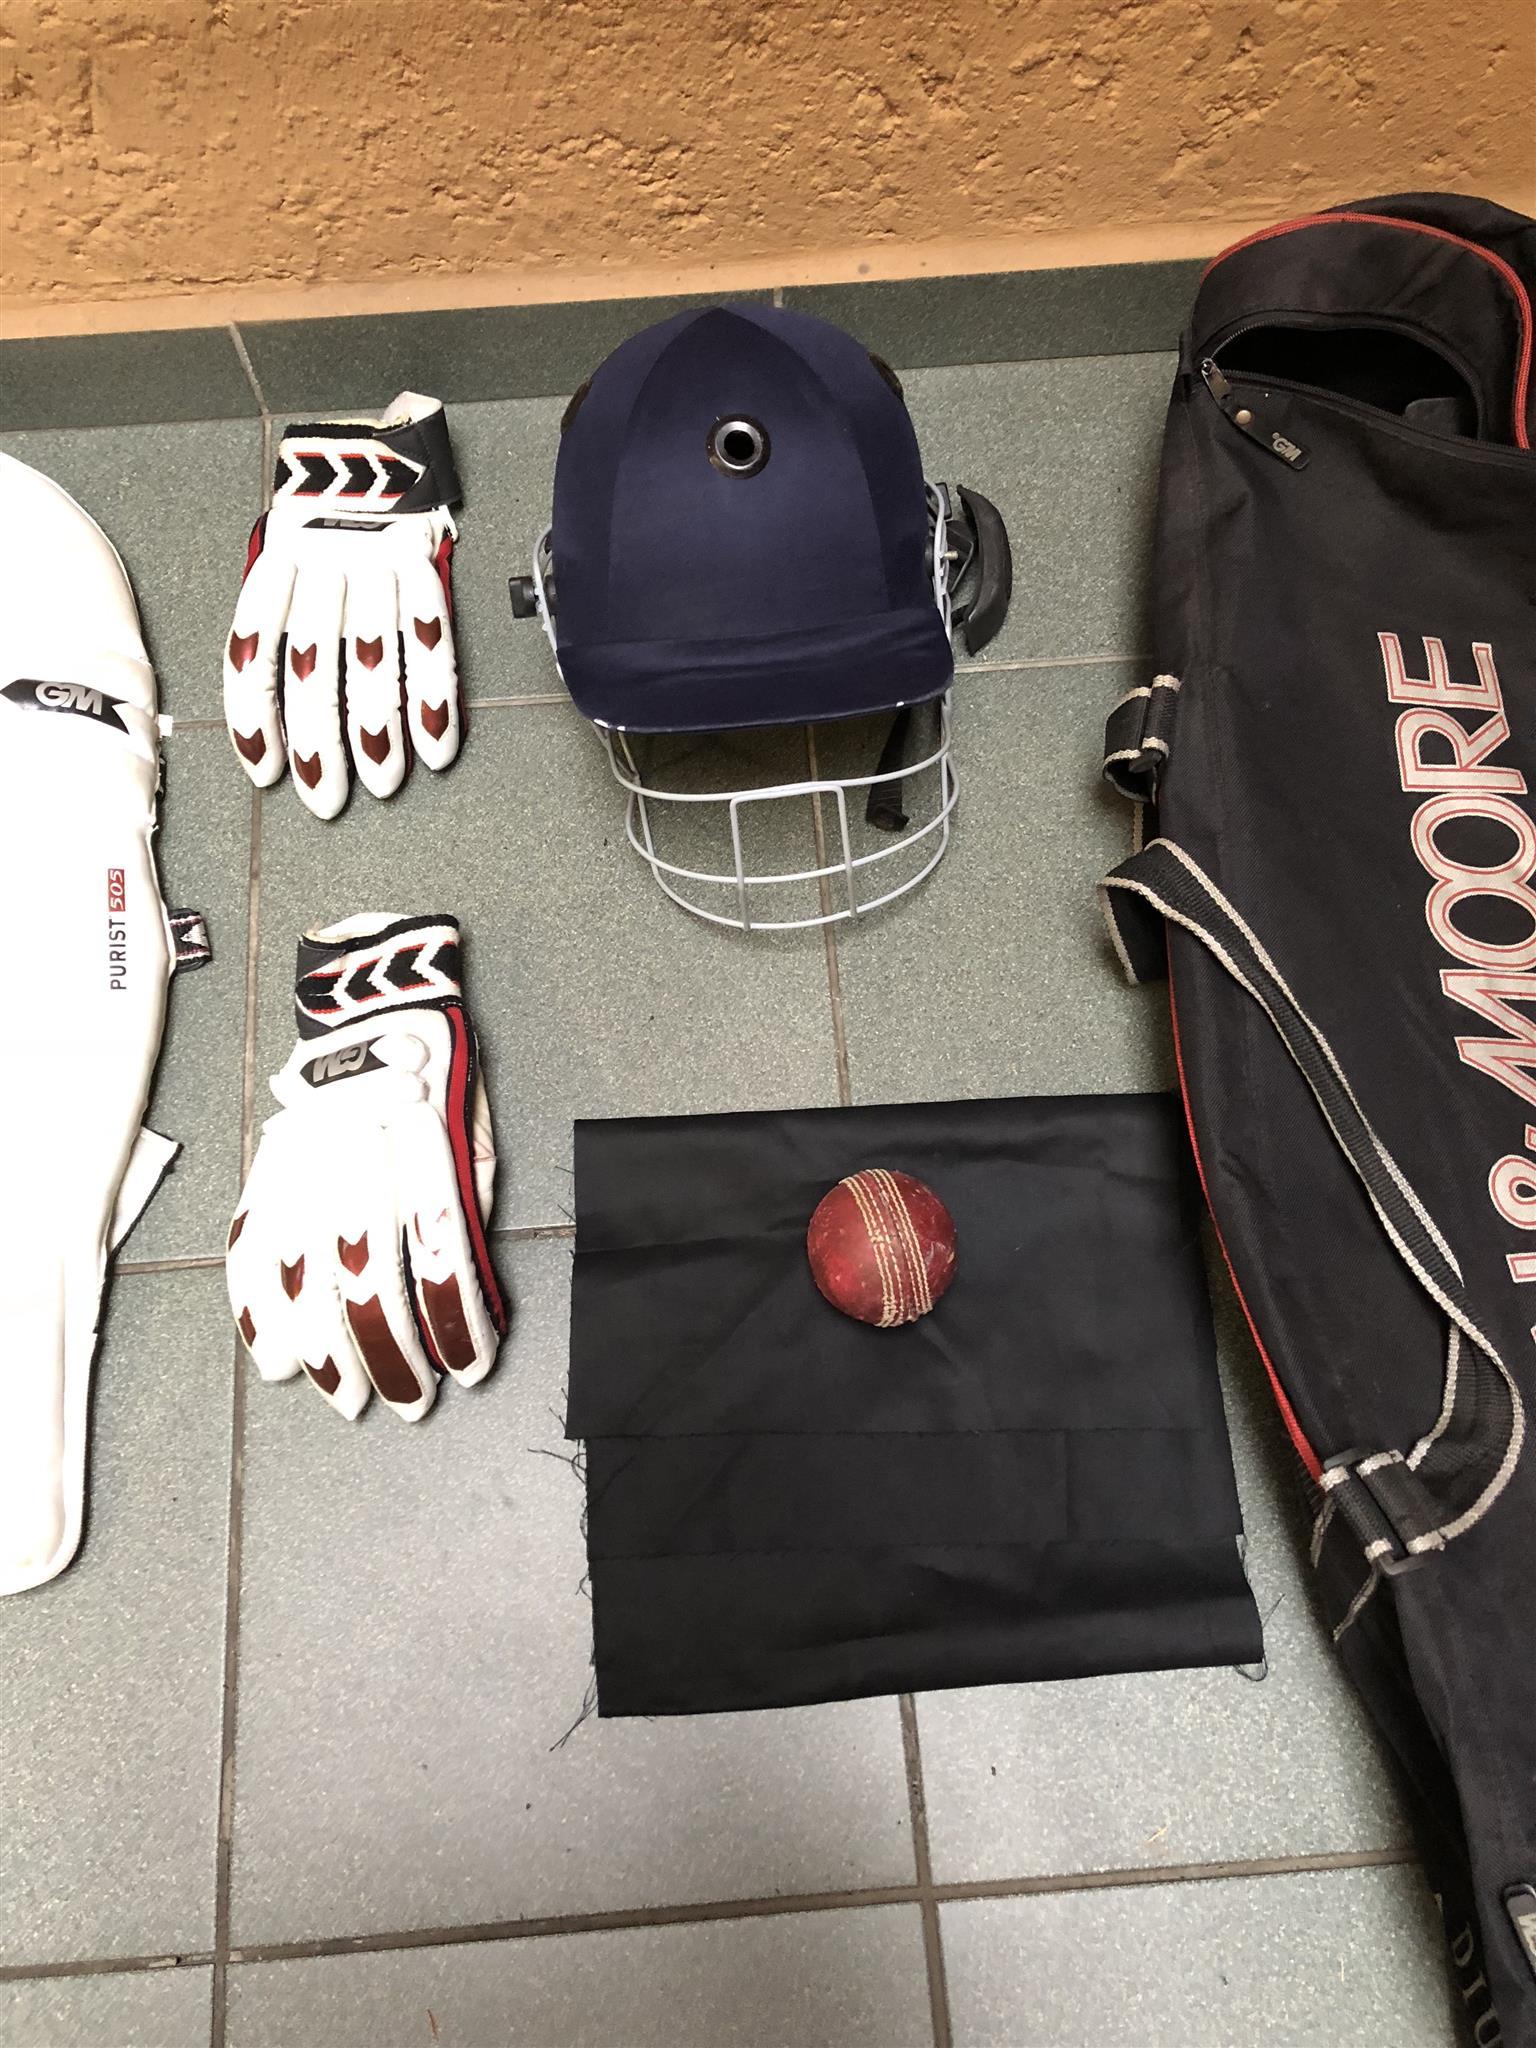 2 x Gunn & Moore cricket sets including bags